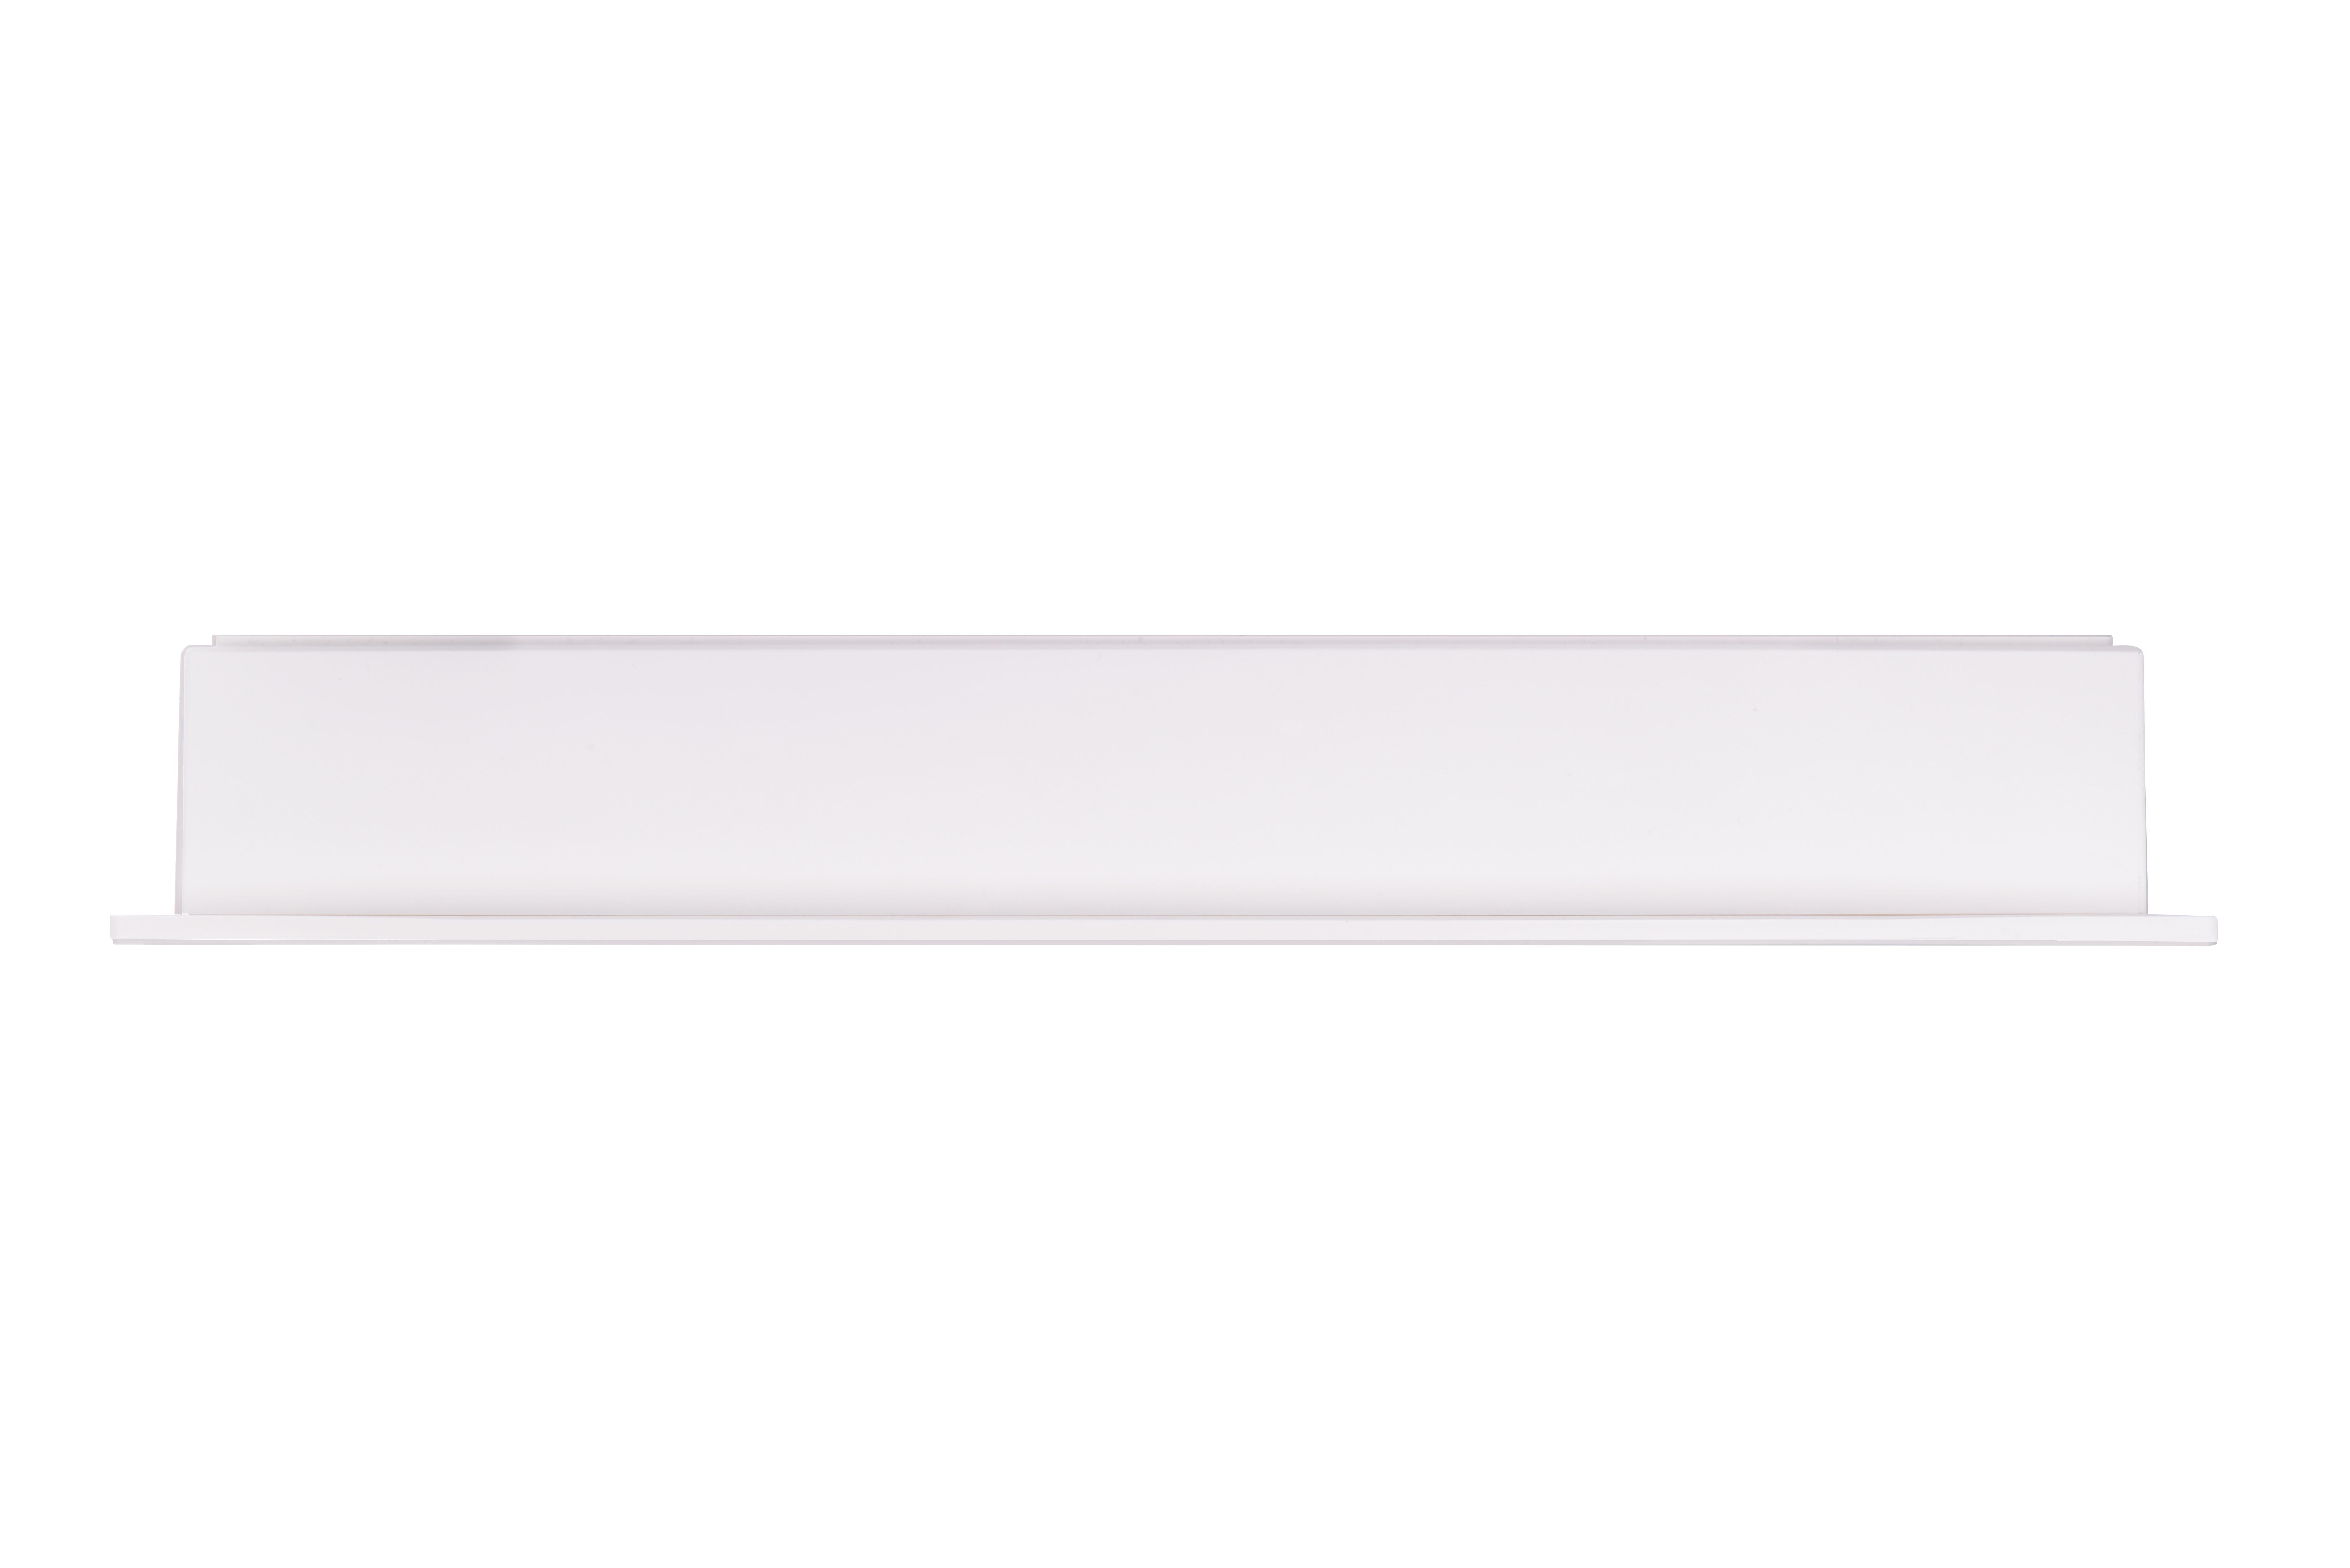 Lampa antipanica led Intelight 94658   3h mentinut test automat 5